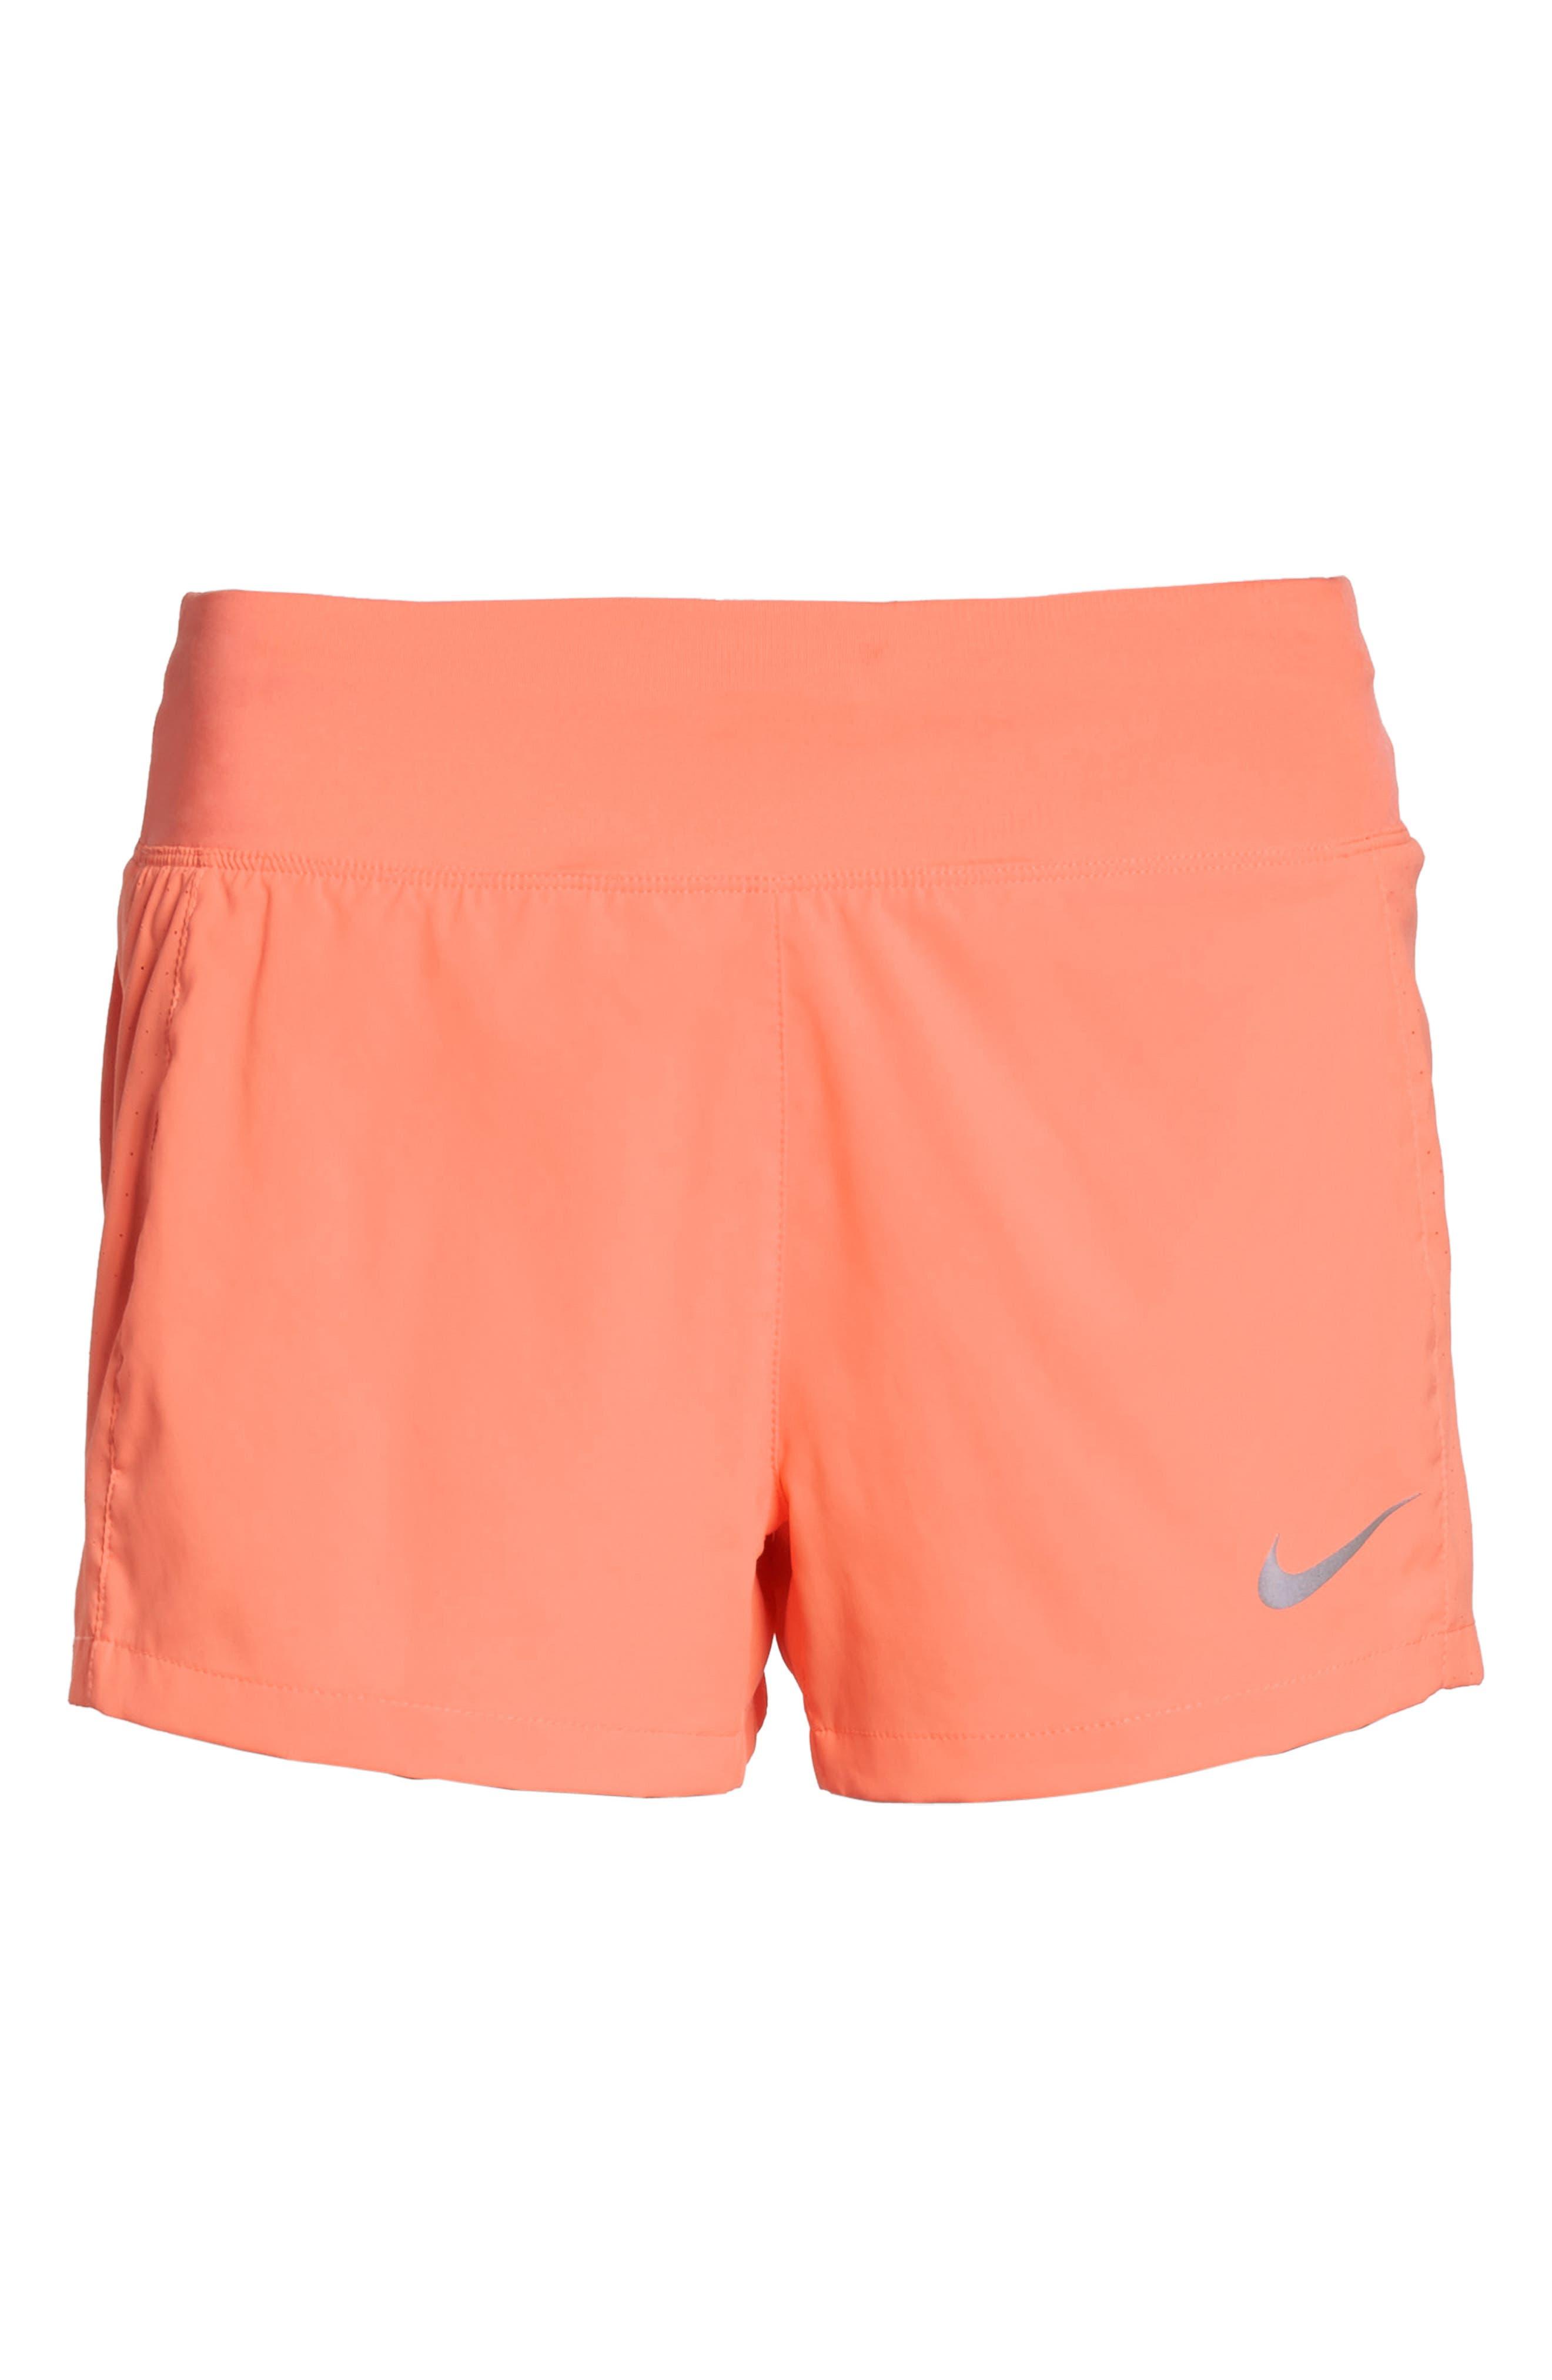 Dry Eclipse Running Shorts,                             Alternate thumbnail 7, color,                             Crimson Pulse